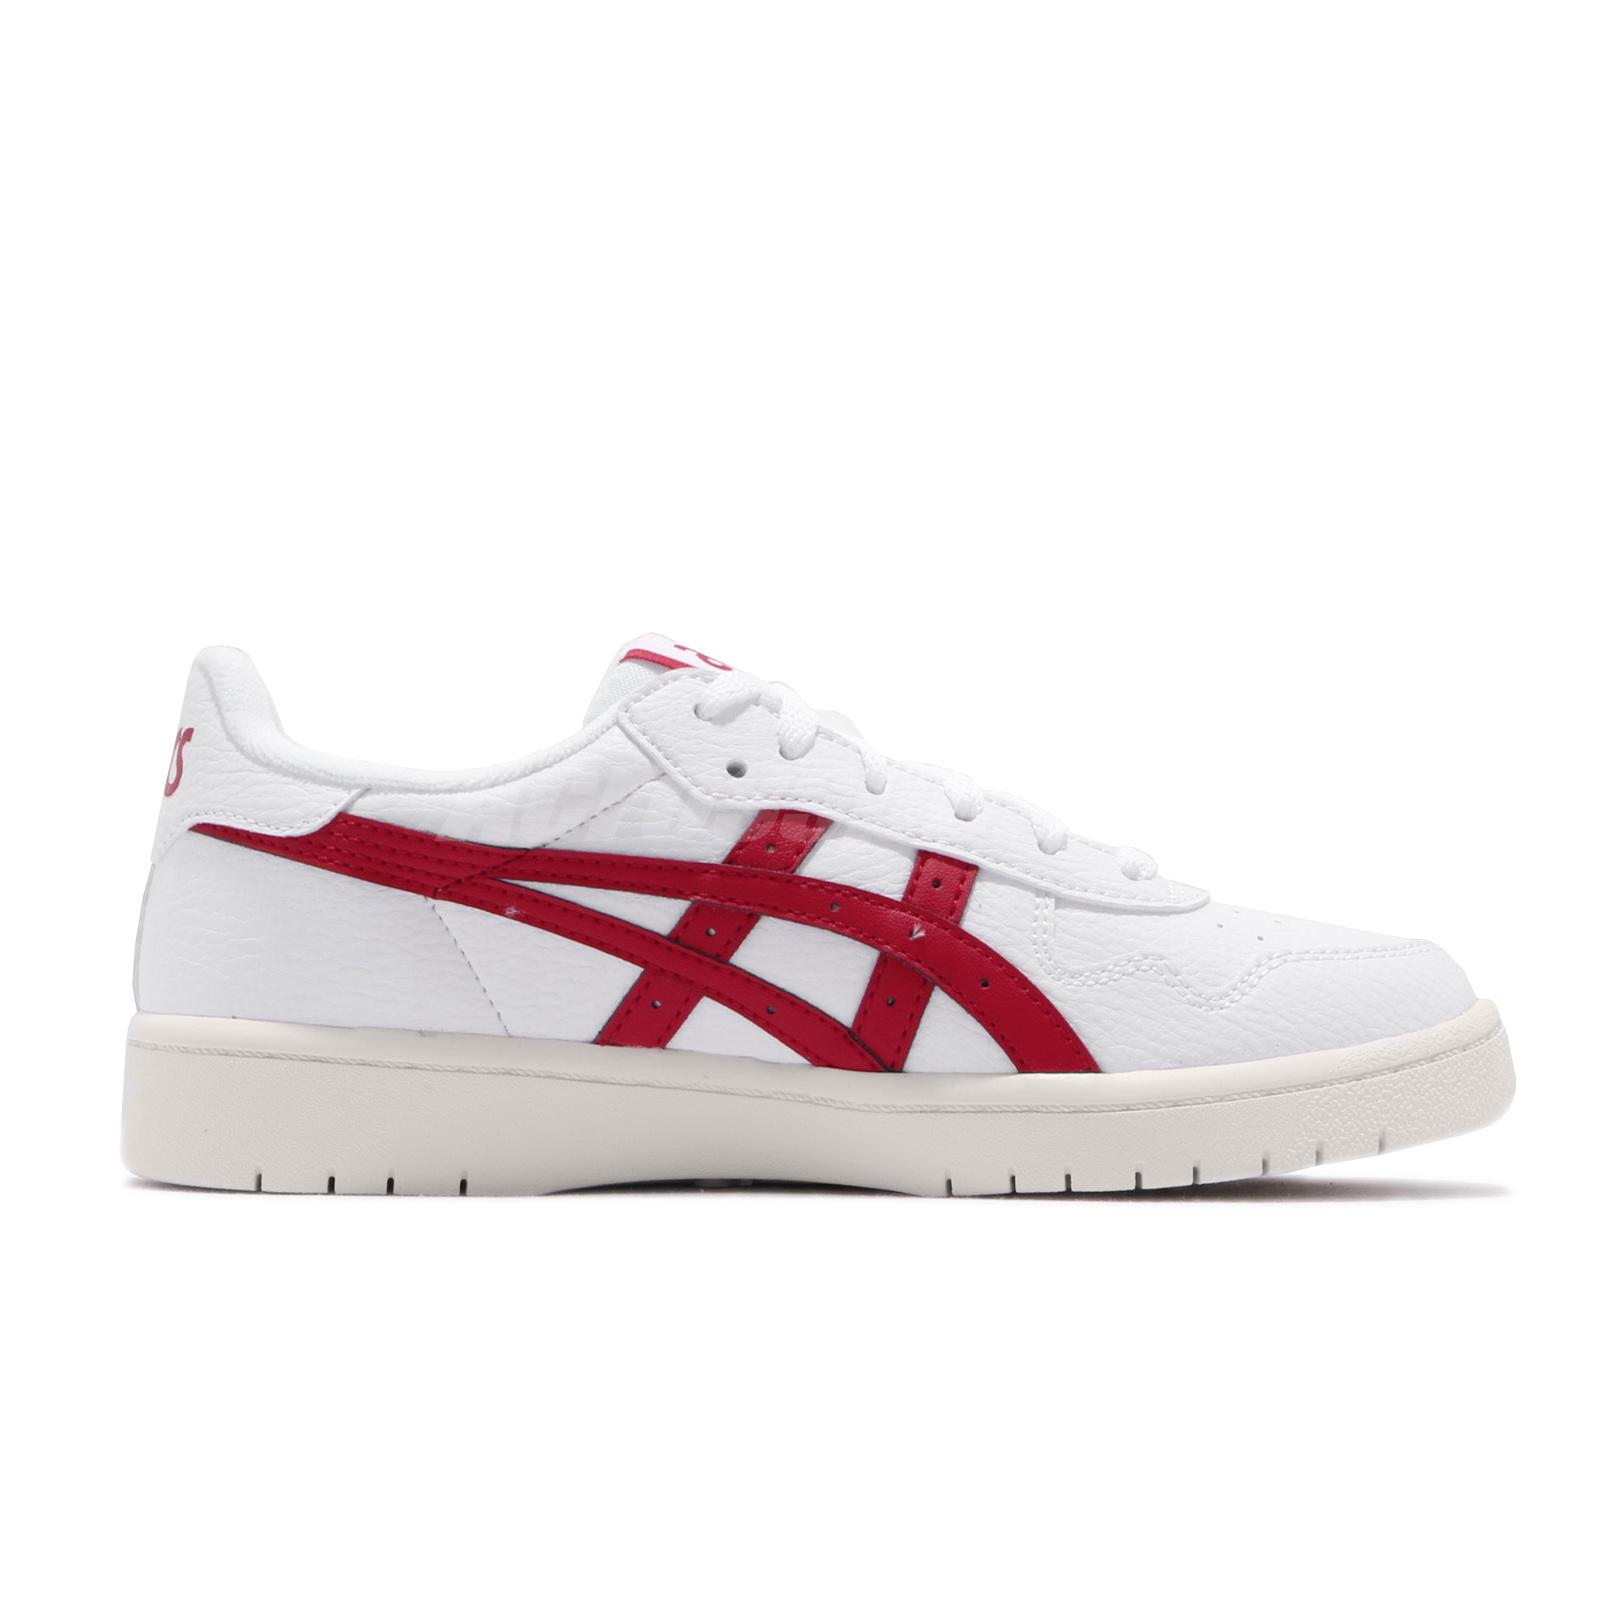 buy asics shoes in japan espa�ol canada